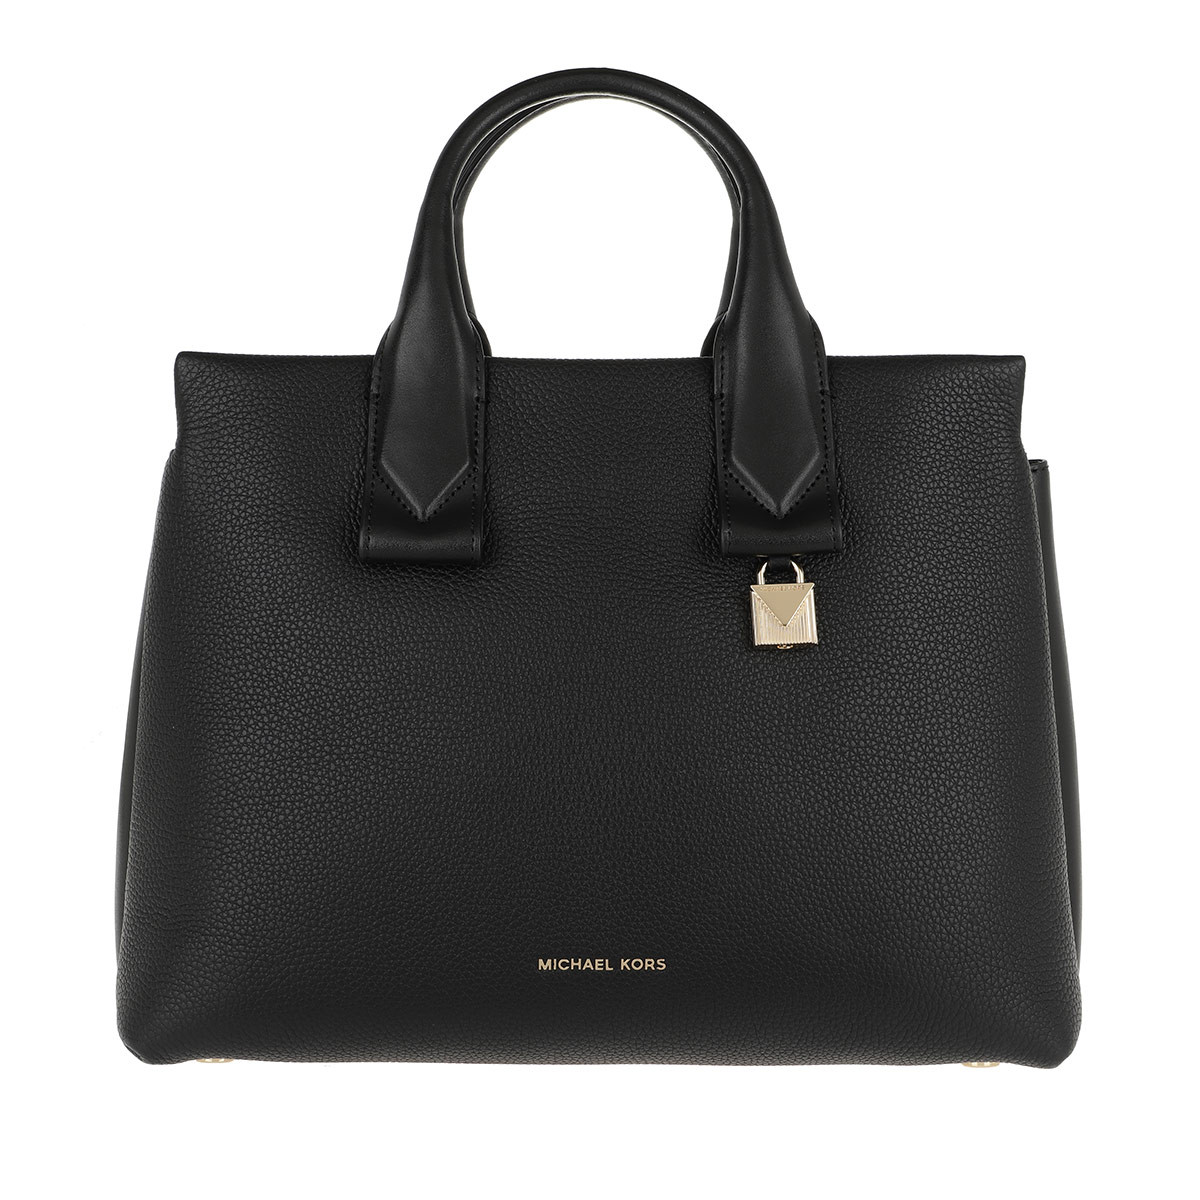 Michael Kors Satchel Bag - Rollins LG Satchel Bag Black - in schwarz - für Damen